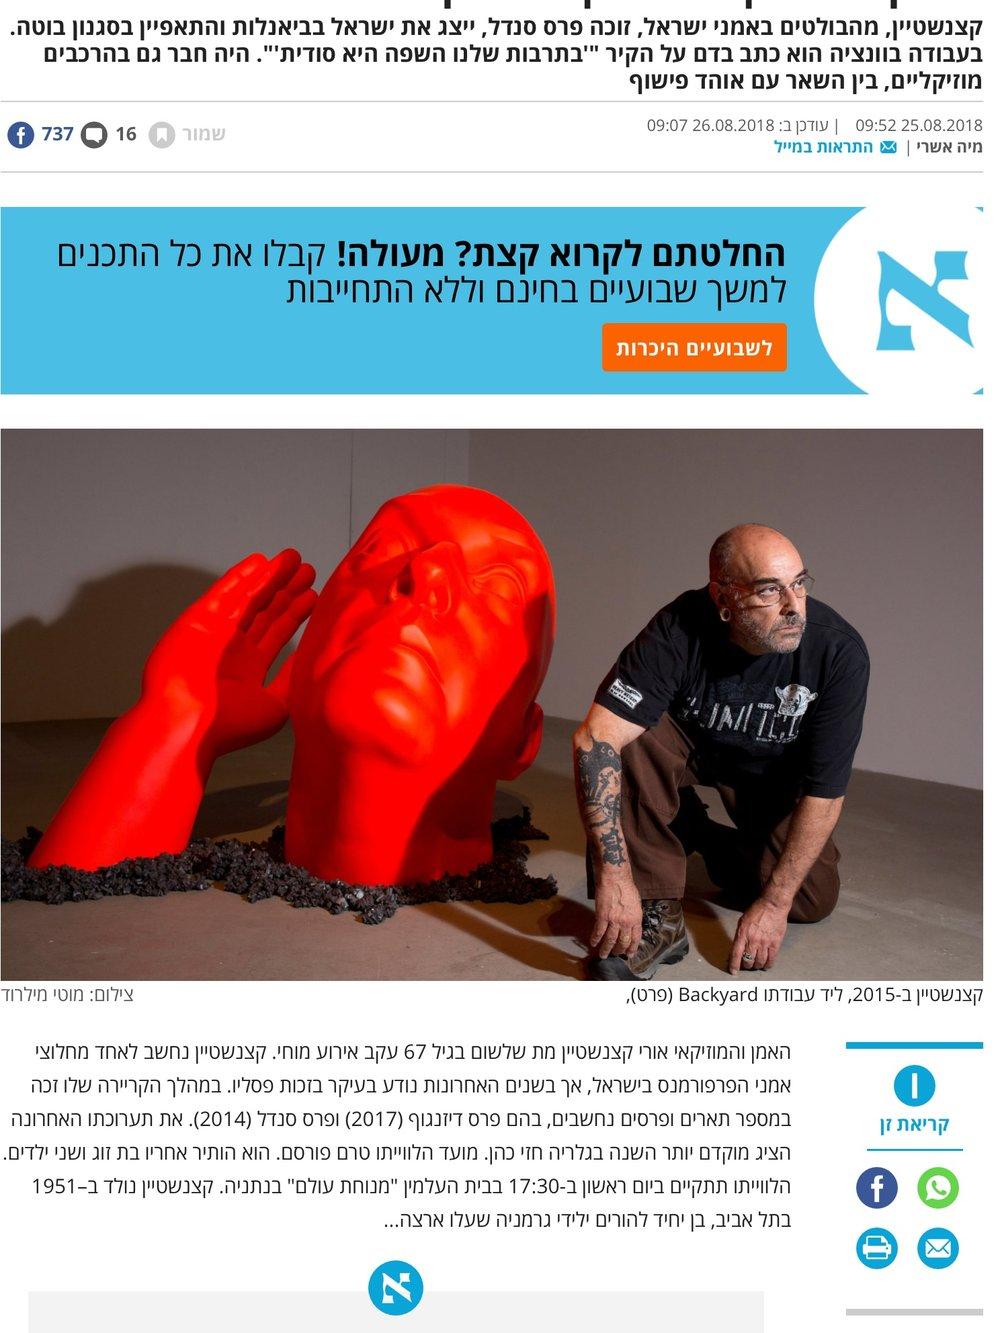 Haaretz   (August 26, 2018) Click  here  to read English version.